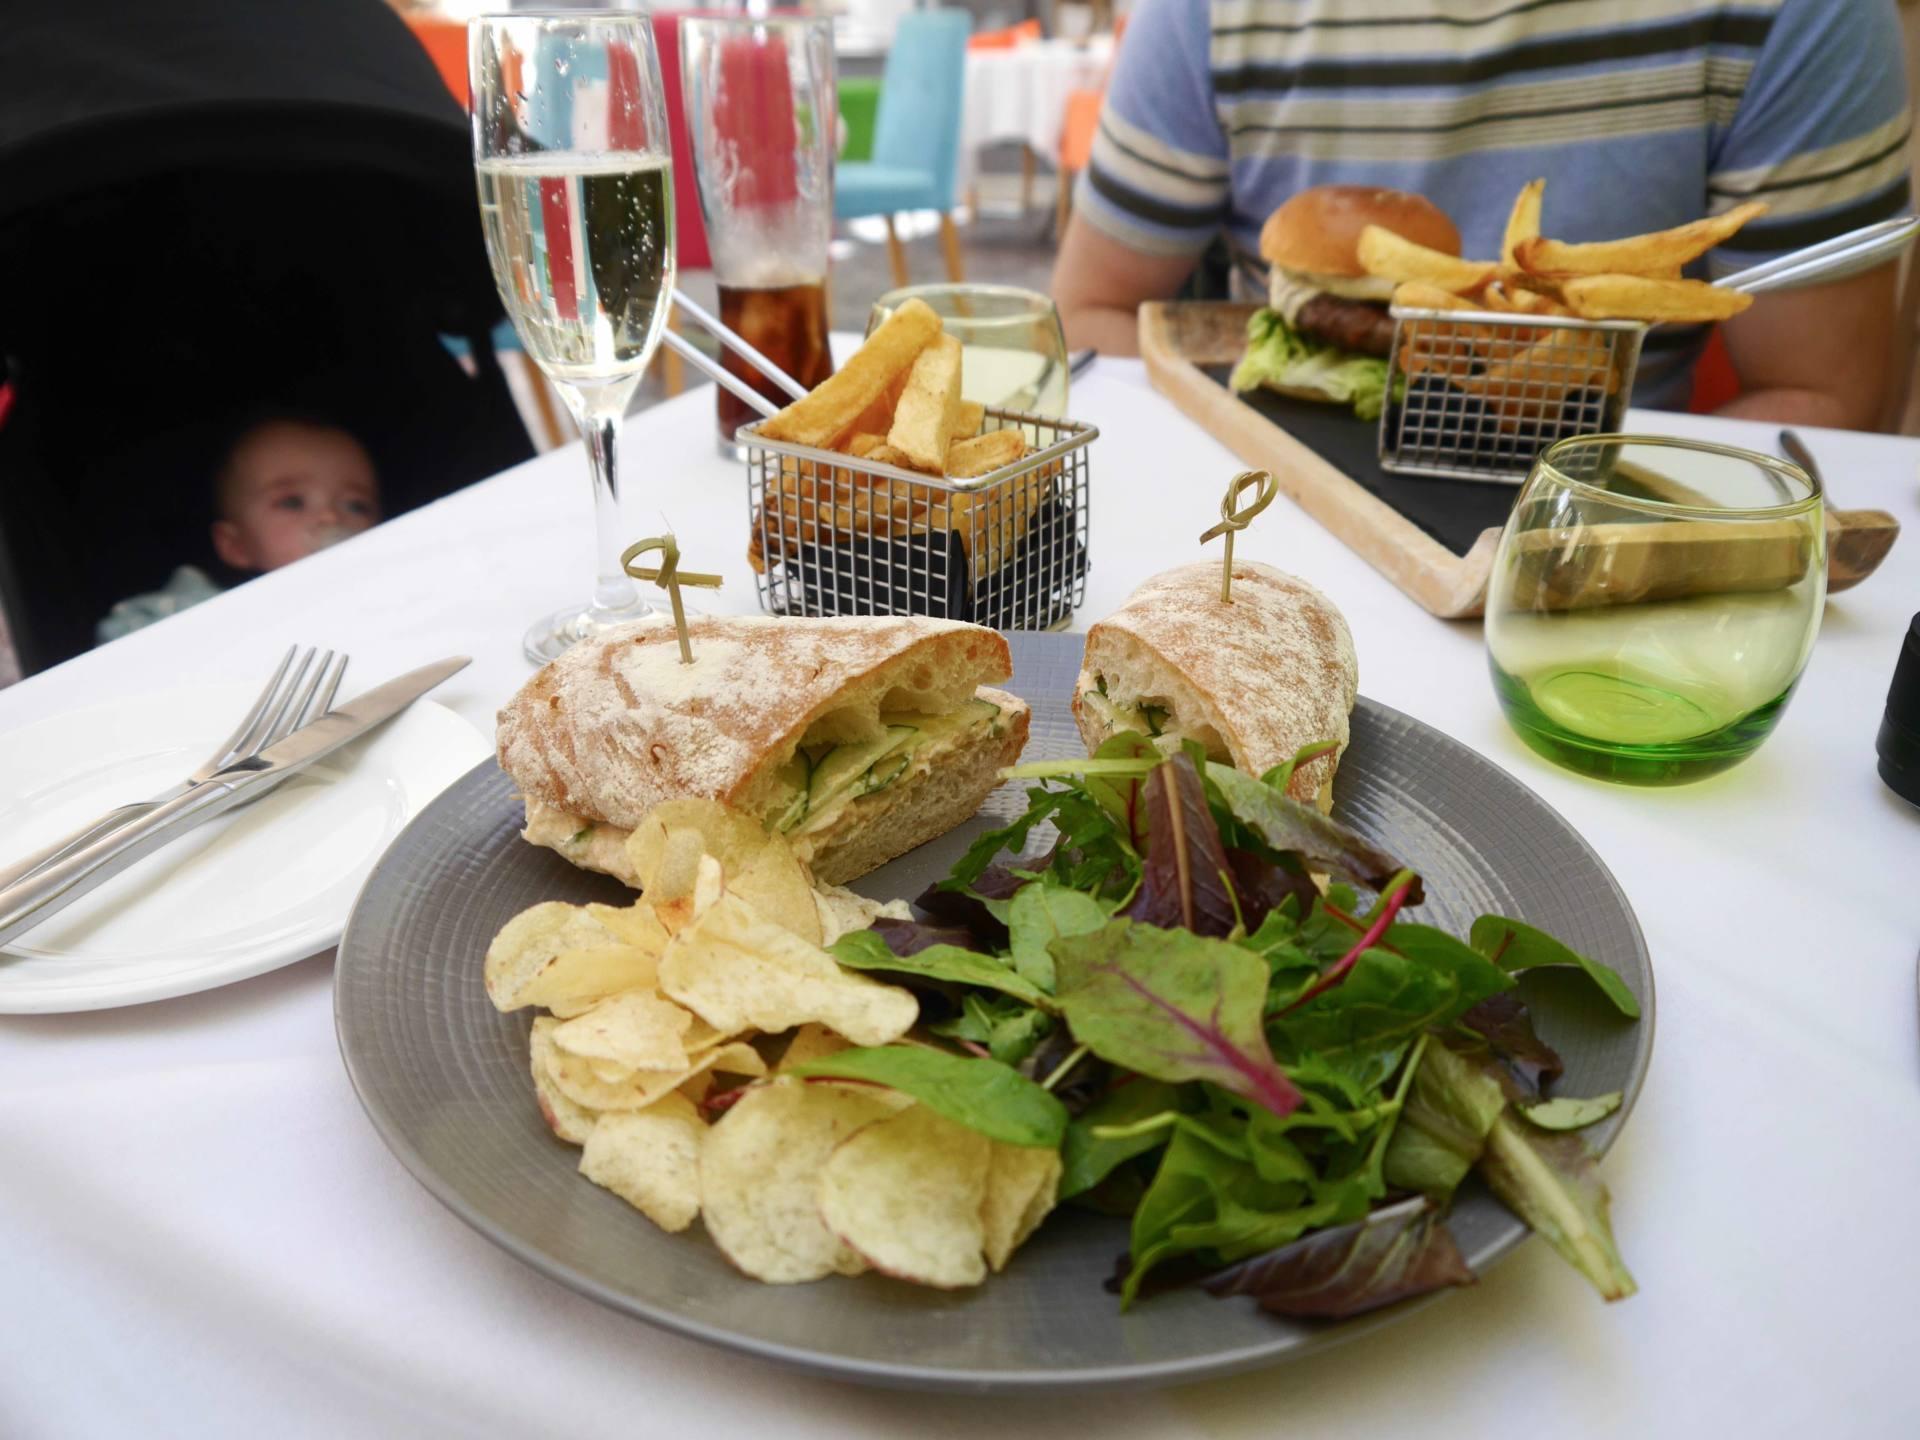 Raithwaite Estate Whitby Crab Ciabatta Sandwich